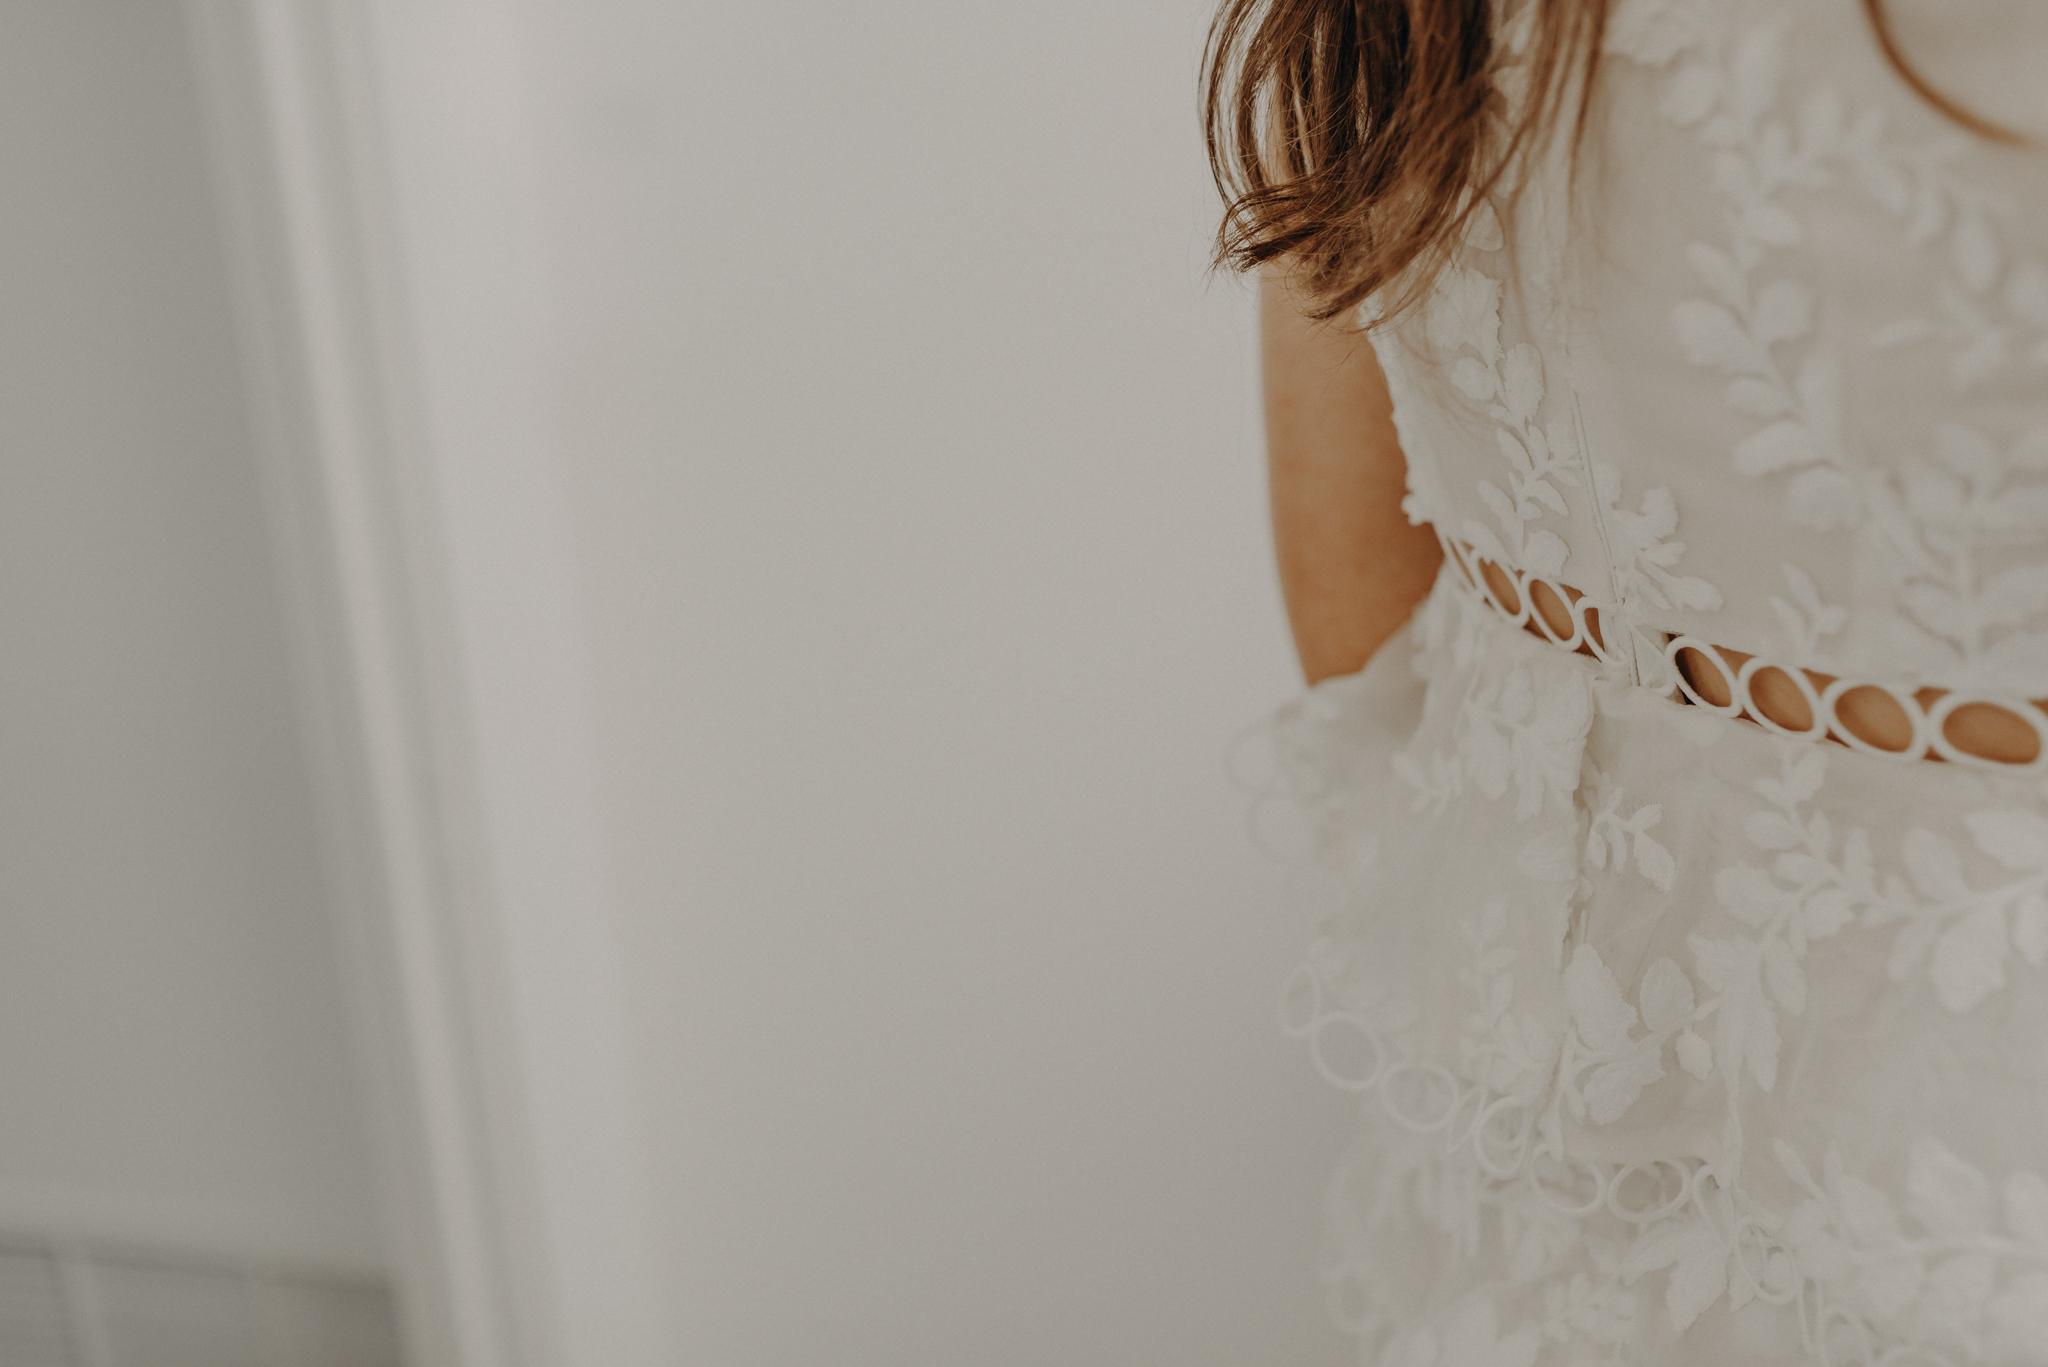 Isaiah + Taylor Photography - Private Estate Backyard Wedding - Beverly Hills - Los Angeles Wedding Photographer - 09.jpg